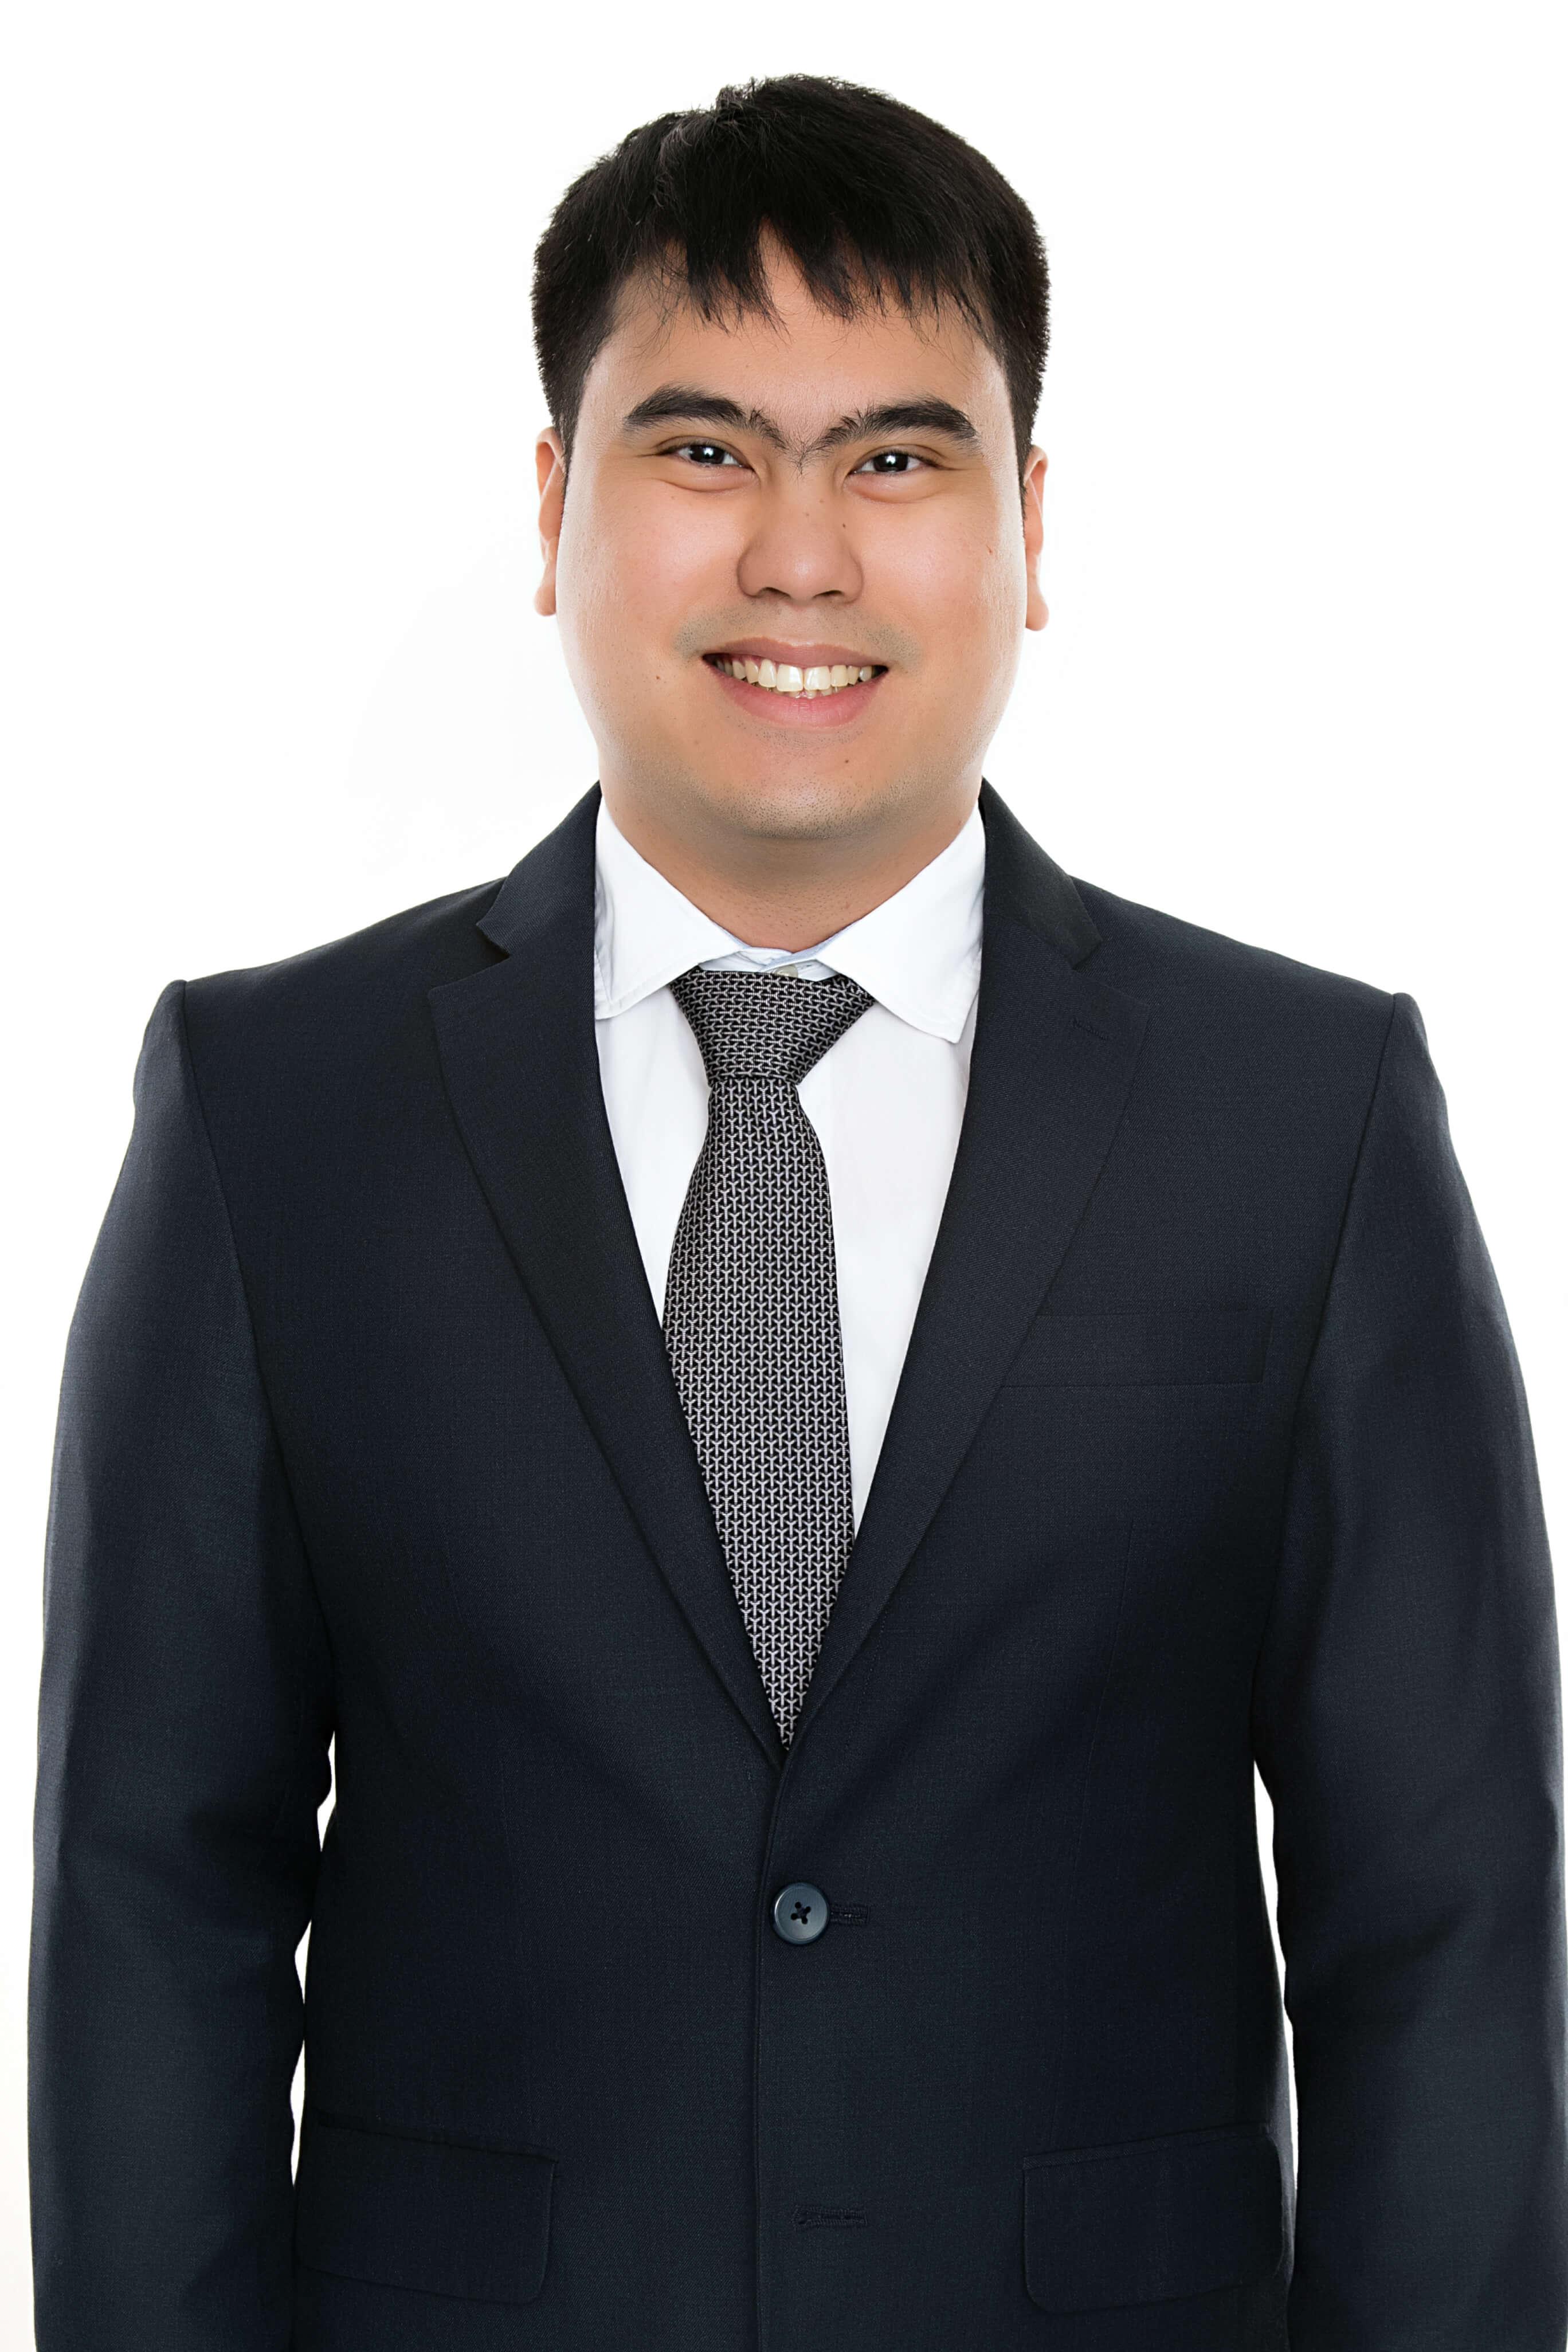 Ryan V. Romero